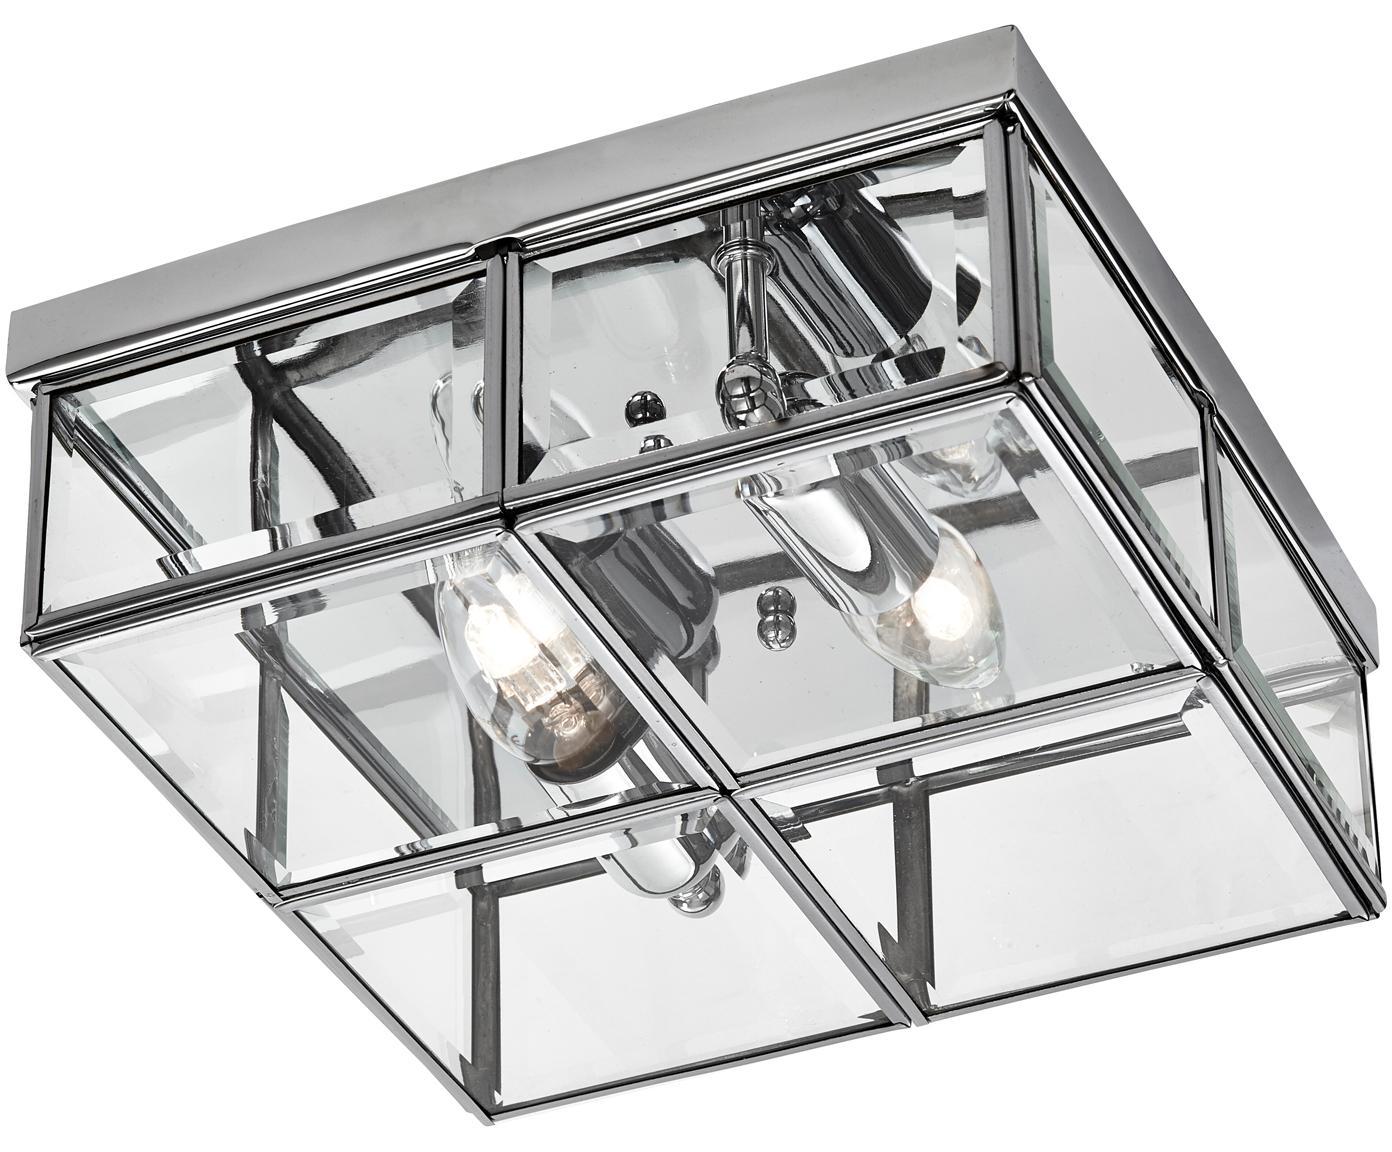 Moderne plafondlamp Ben, Chroomkleurig, transparant, 26 x 10 cm